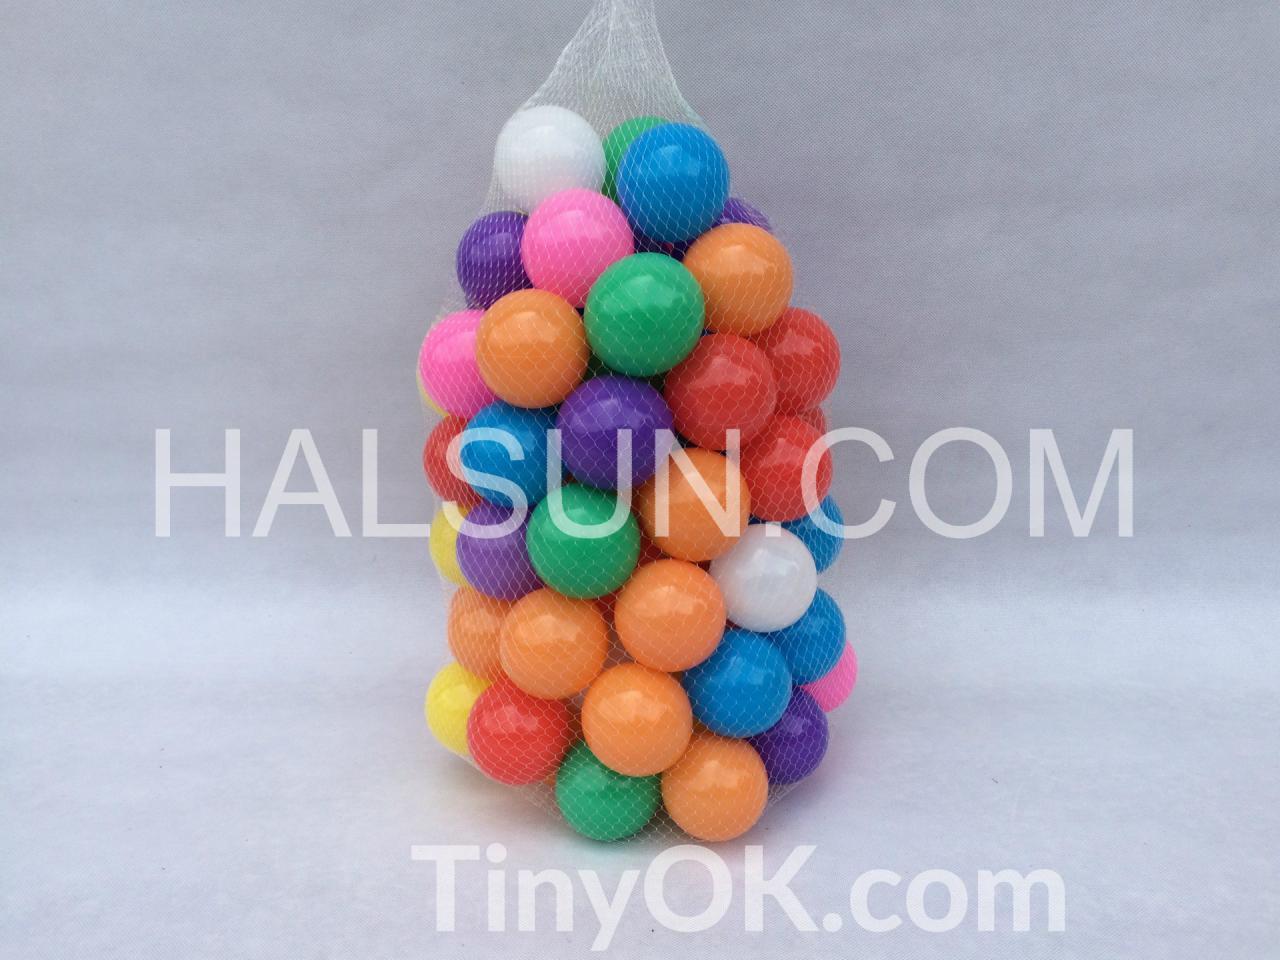 plastic-ocean-balls-6.jpg